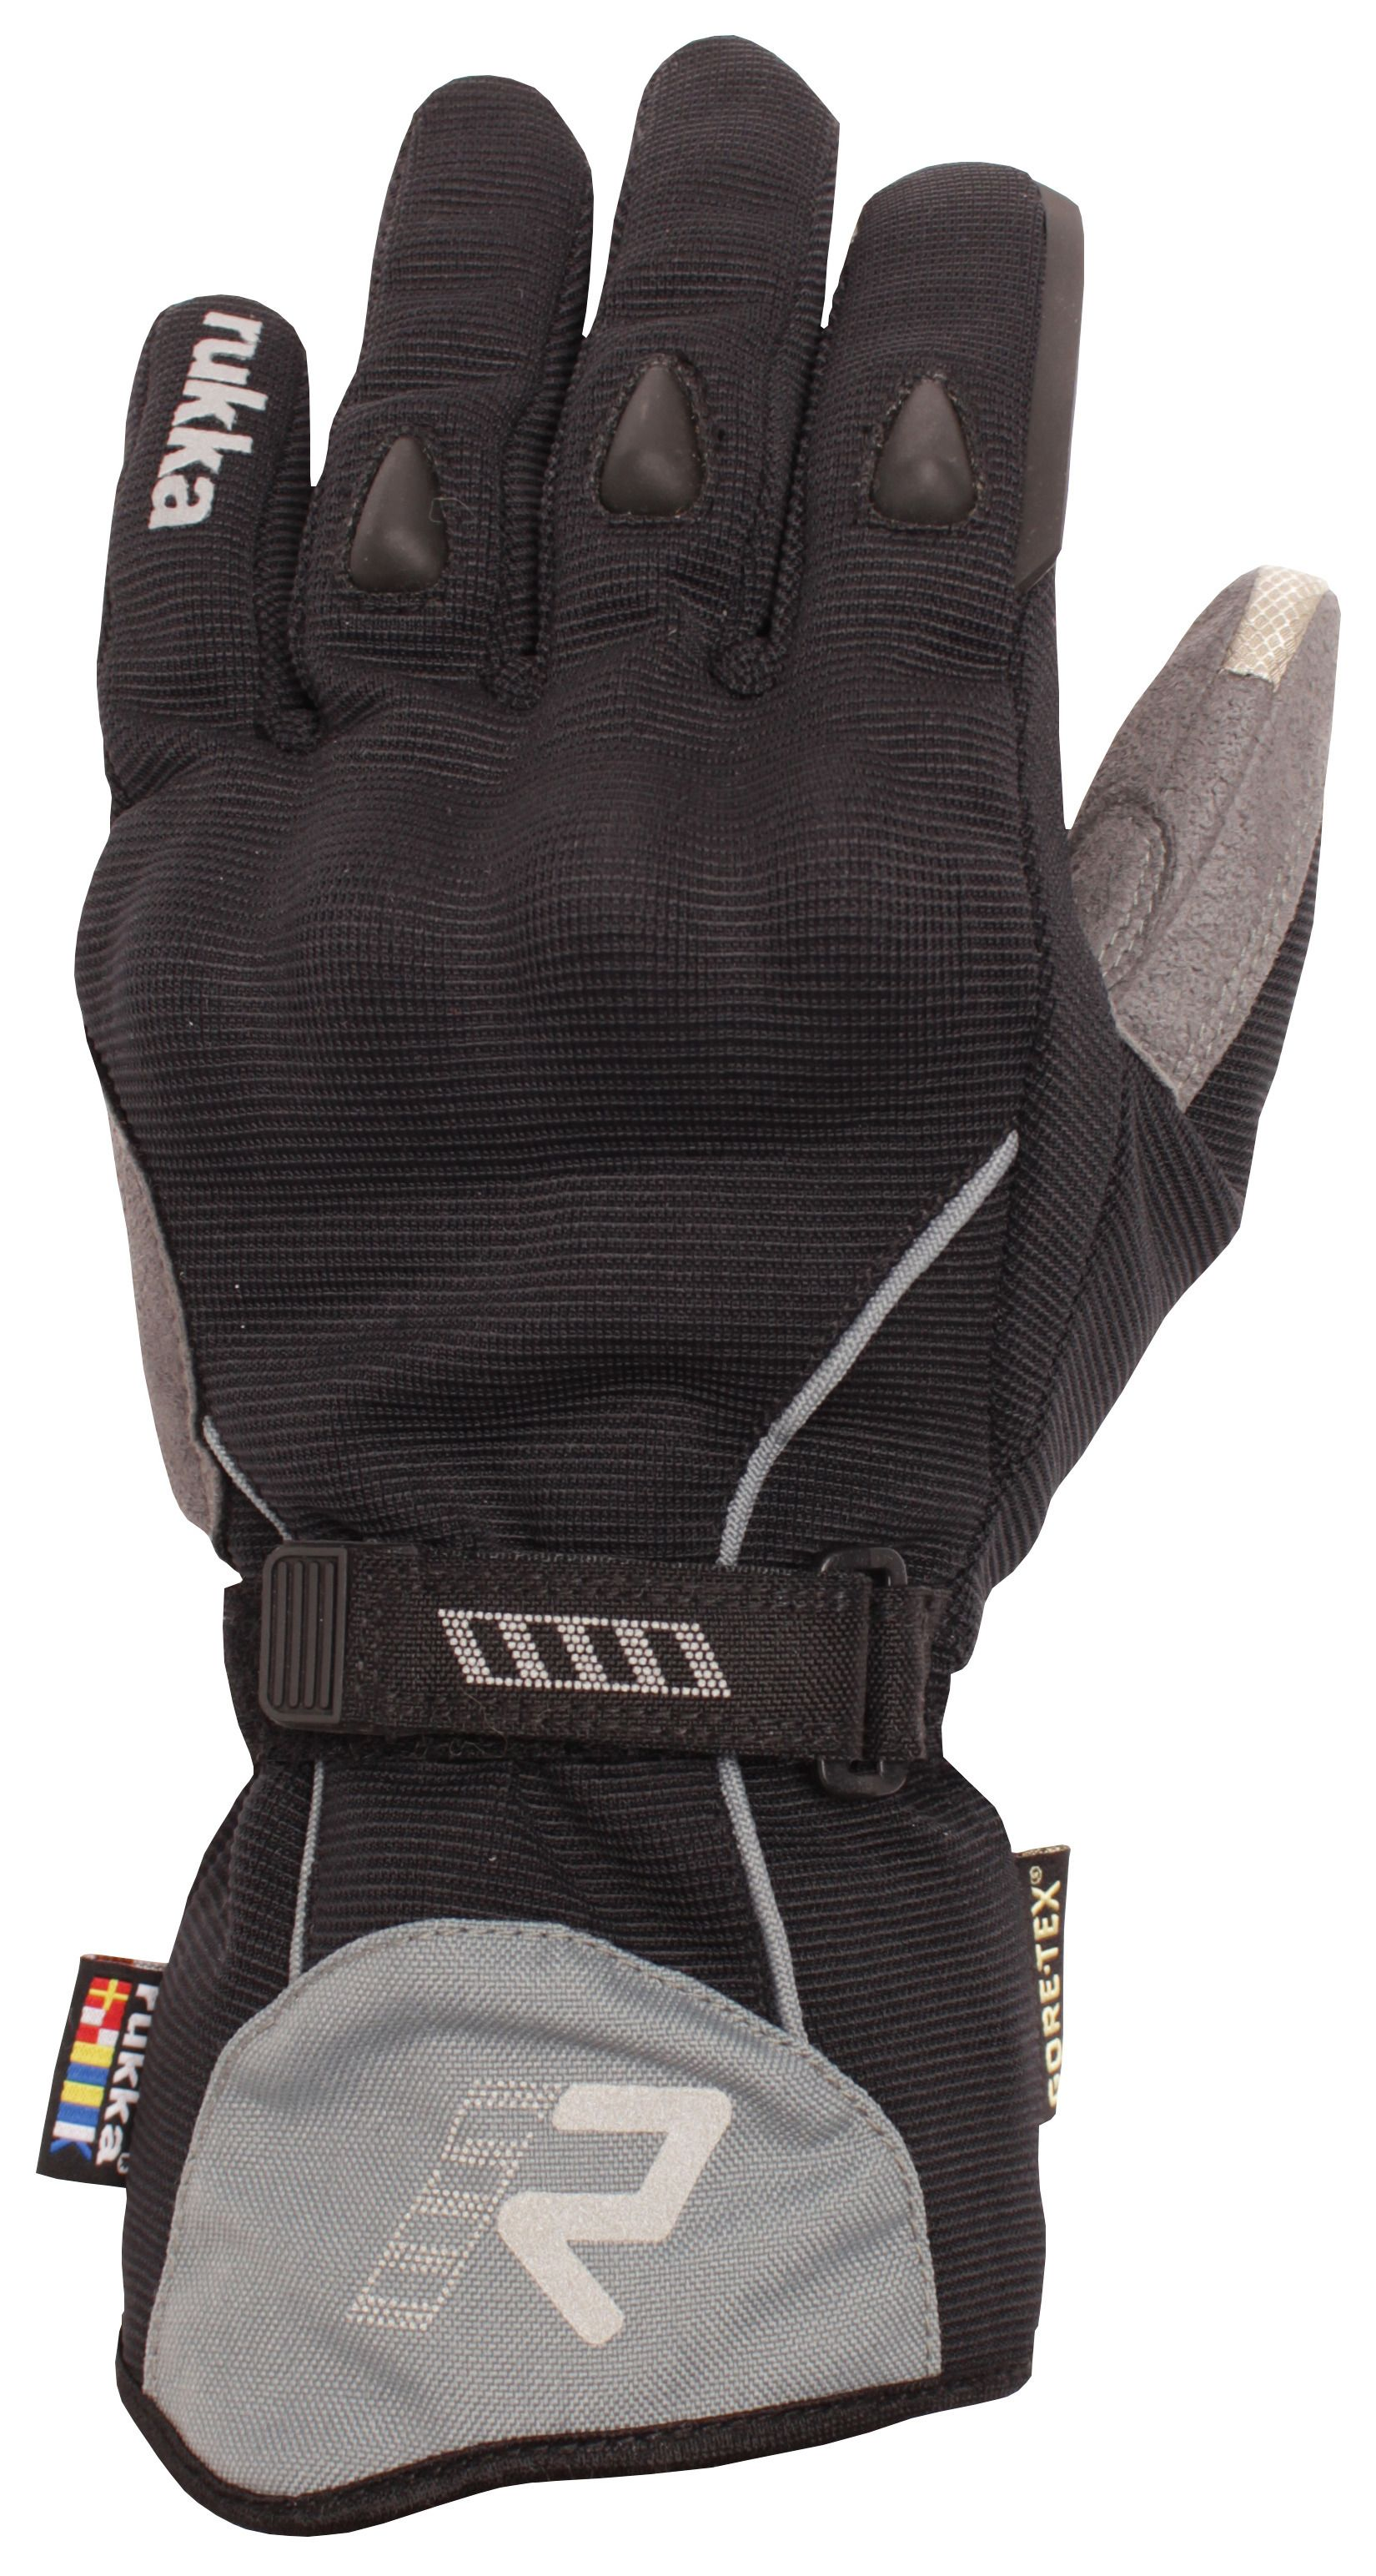 Xtrafit motorcycle gloves - Xtrafit Motorcycle Gloves 22